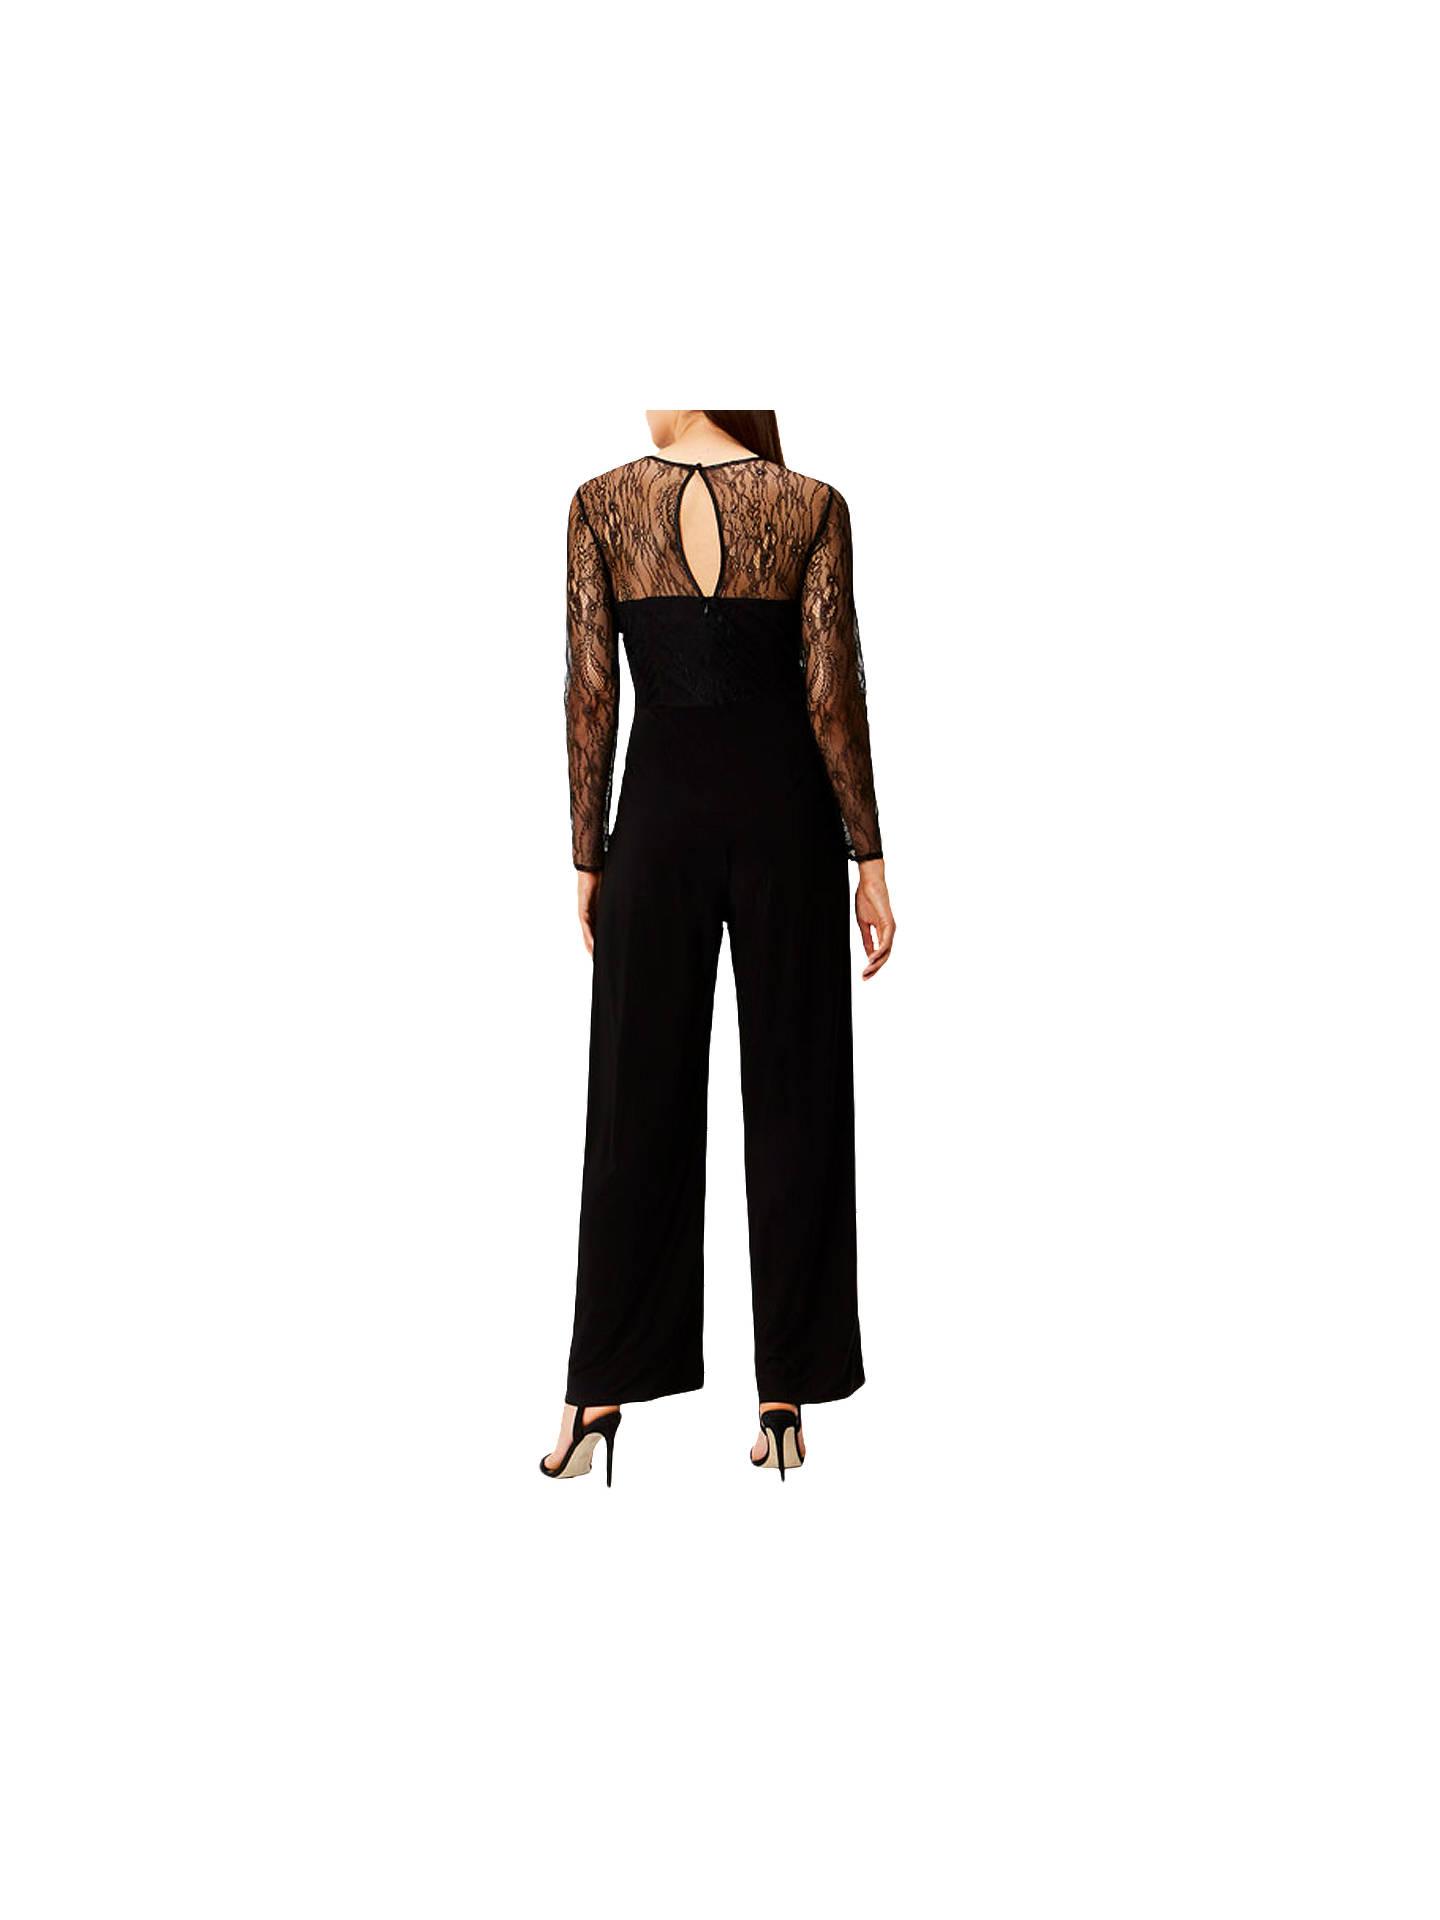 0db7f4d6d17 ... Buy Coast Chi Lace Sleeve Jumpsuit